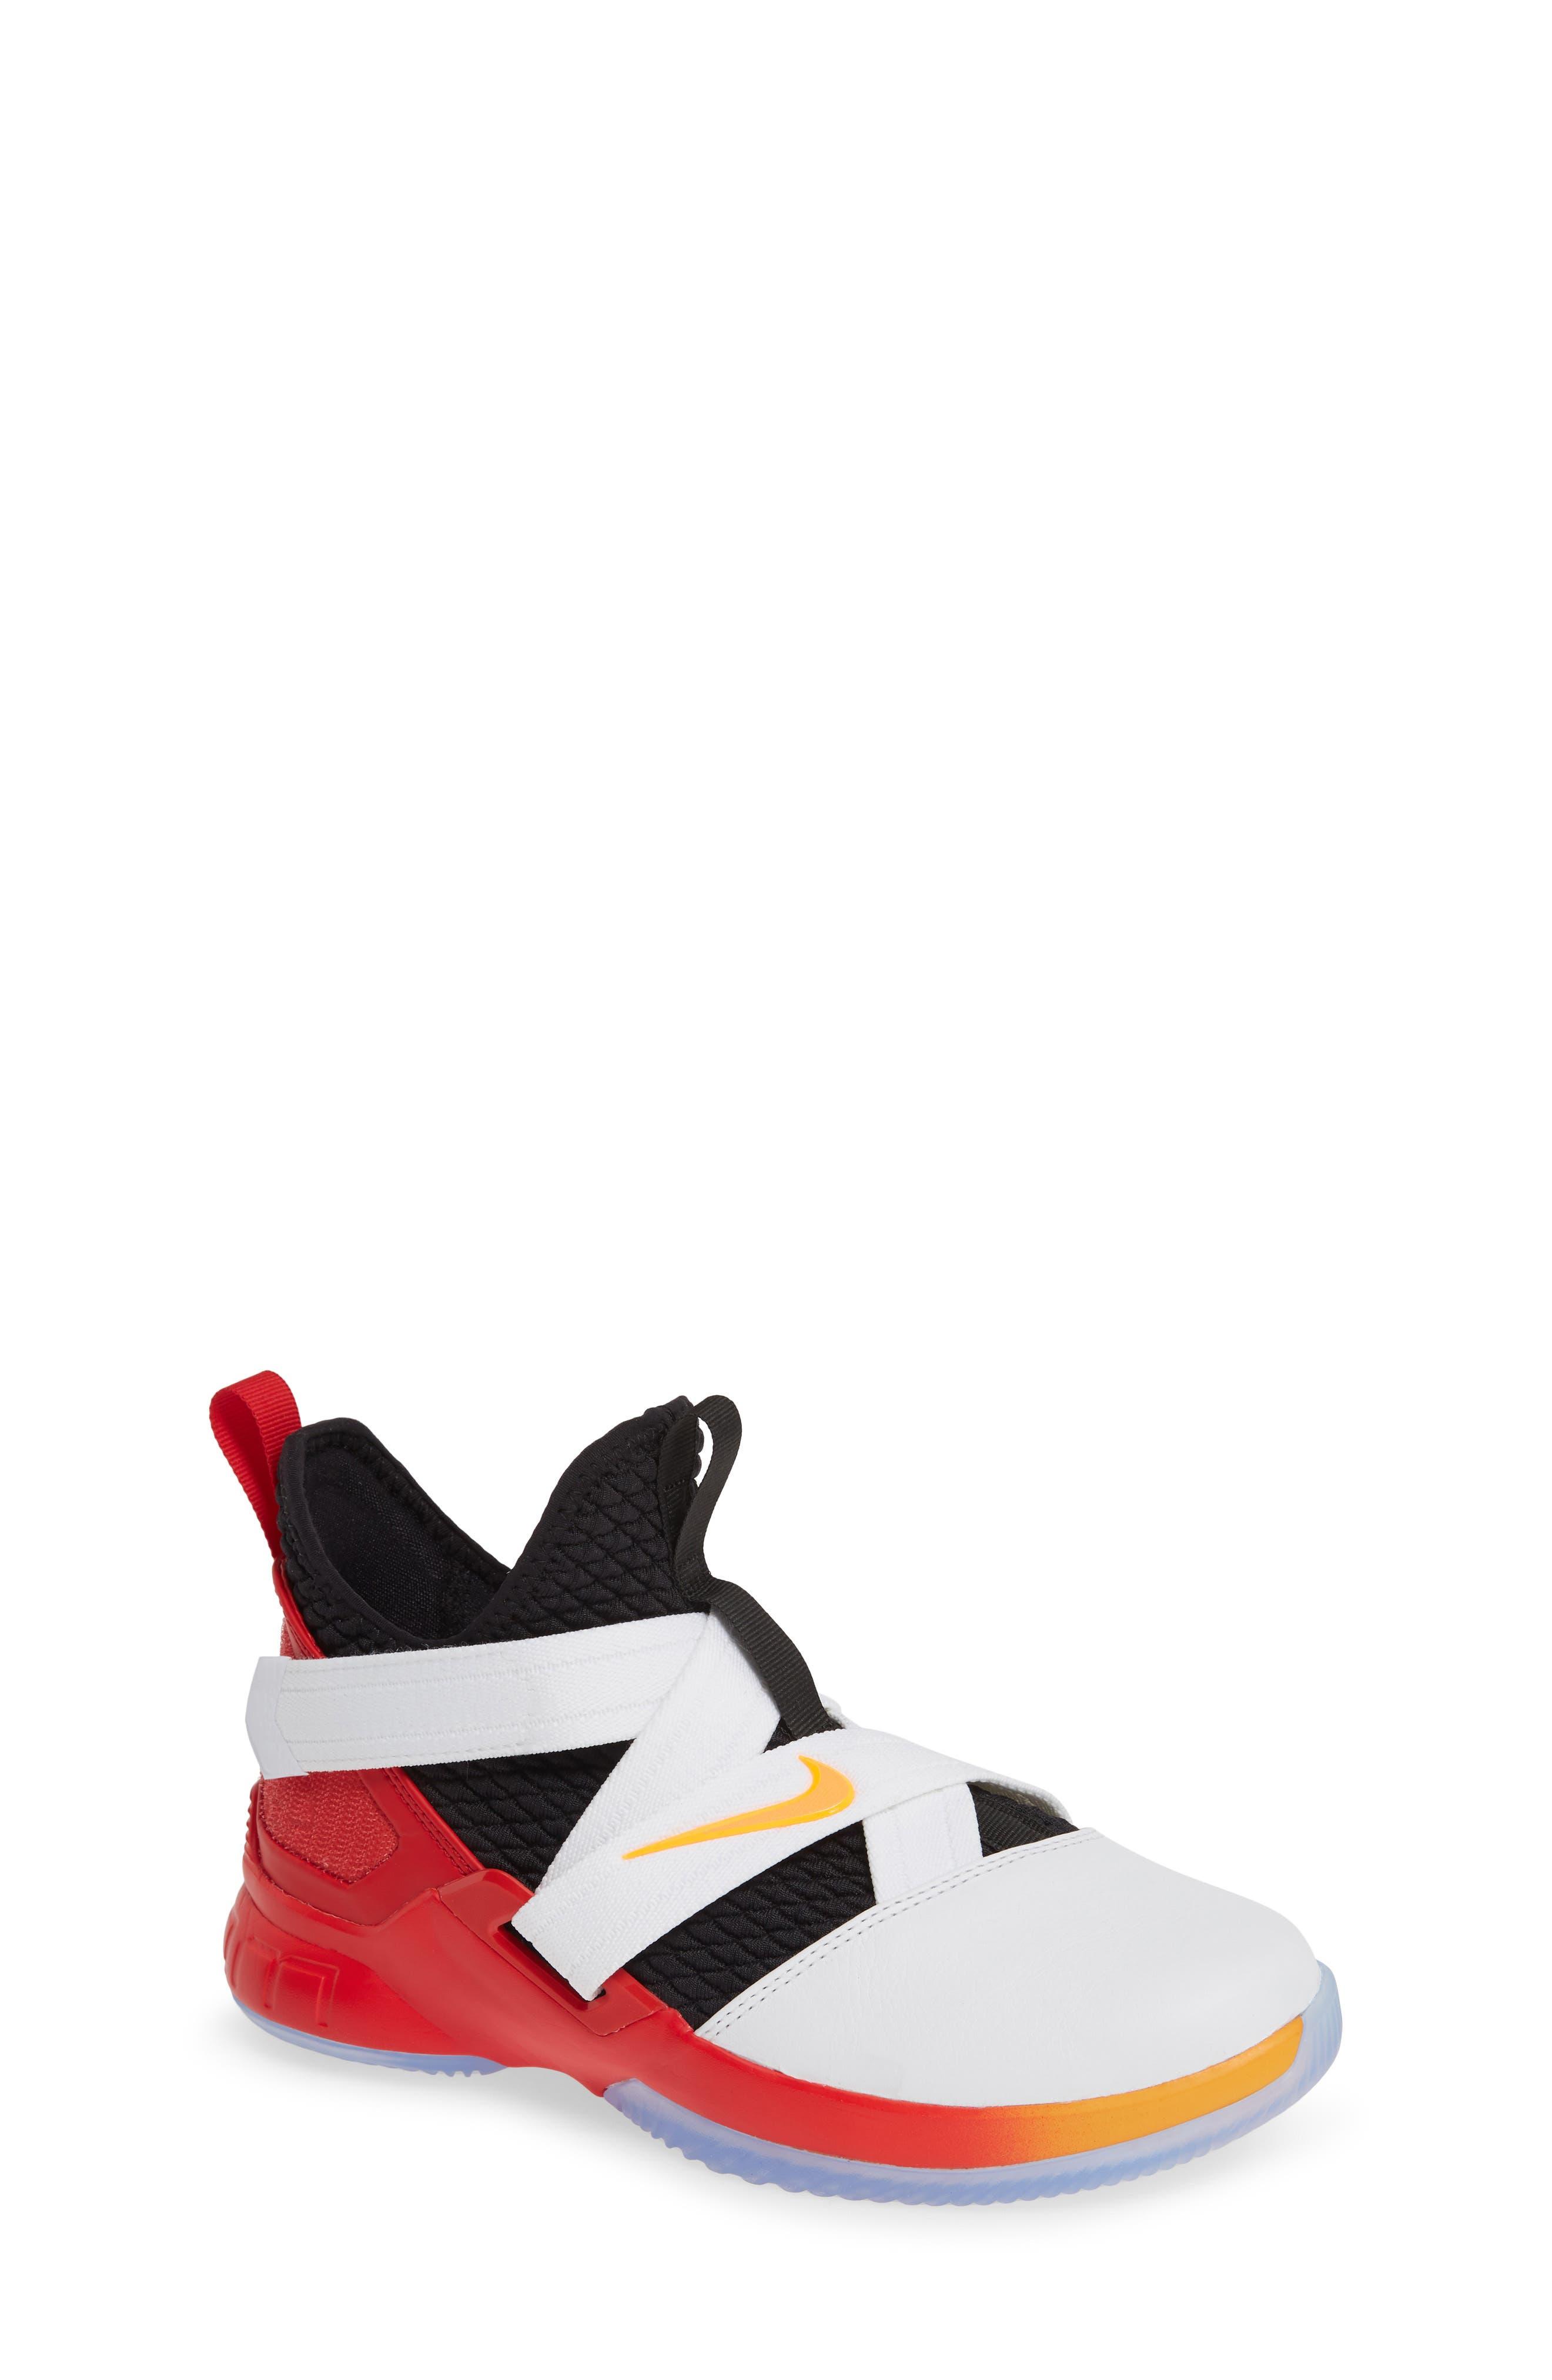 NIKE, LeBron Soldier XII Basketball Shoe, Main thumbnail 1, color, WHITE/ LASER ORANGE-BLACK-RED